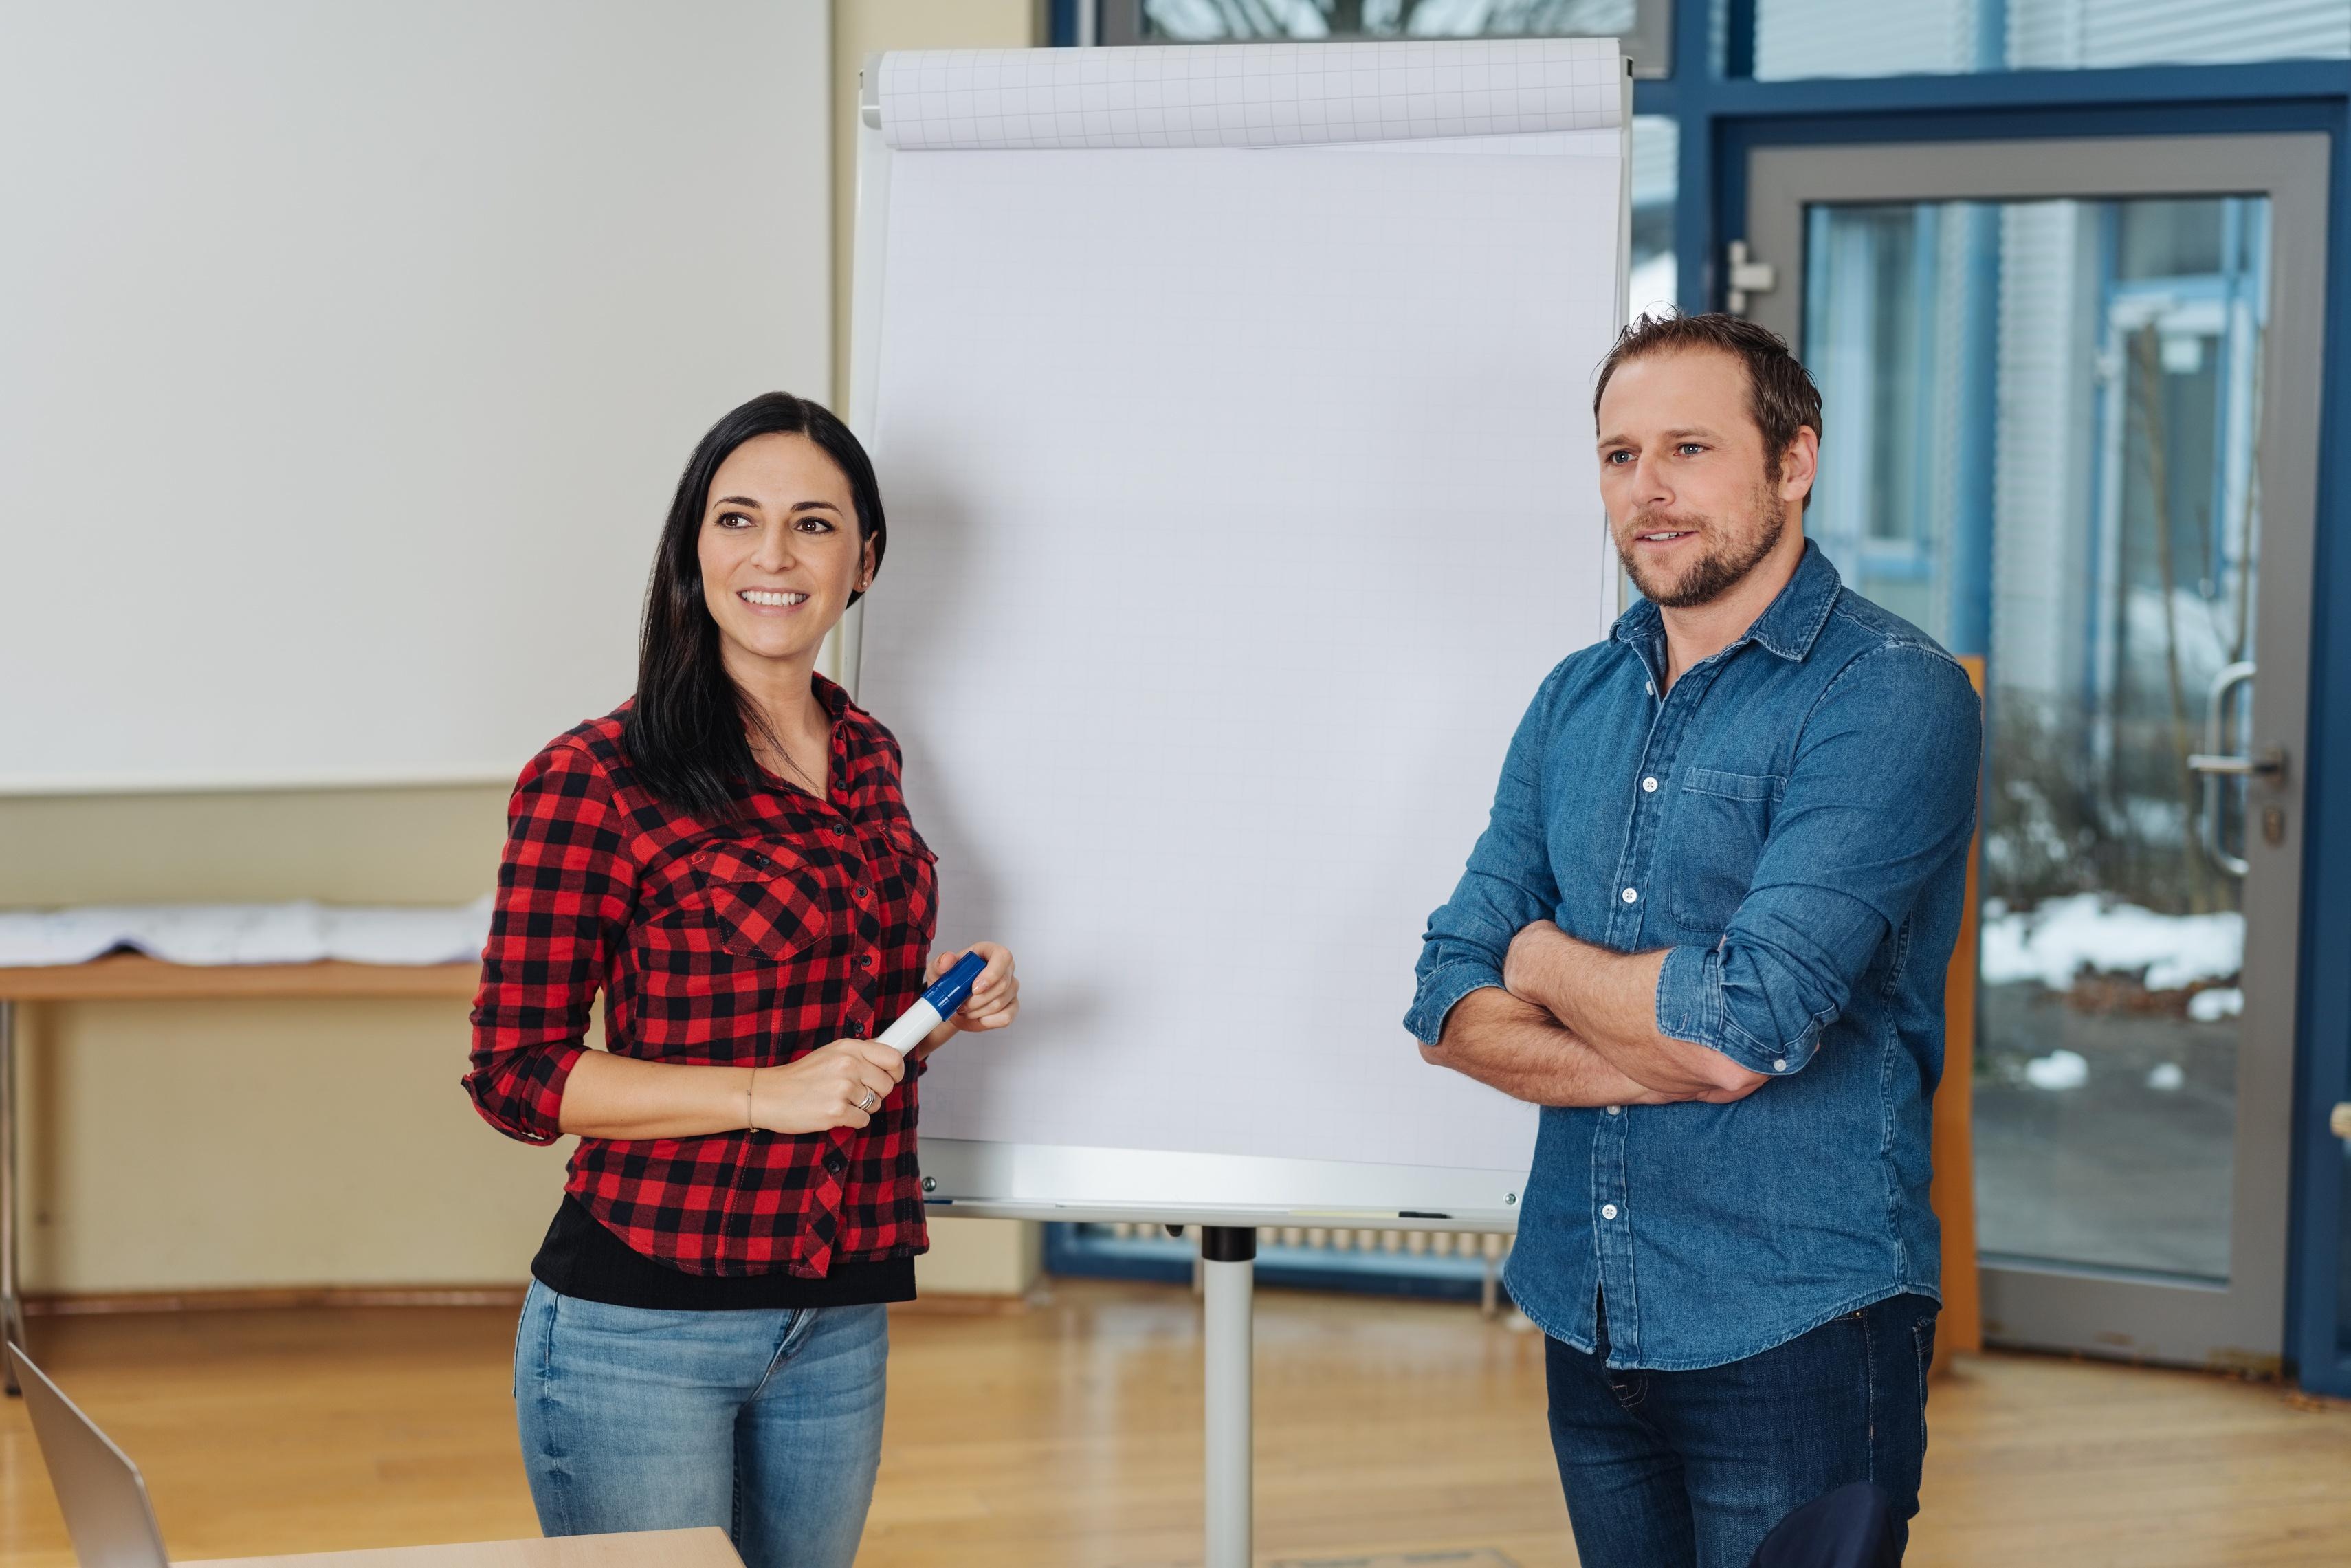 management-leadership-collaboration